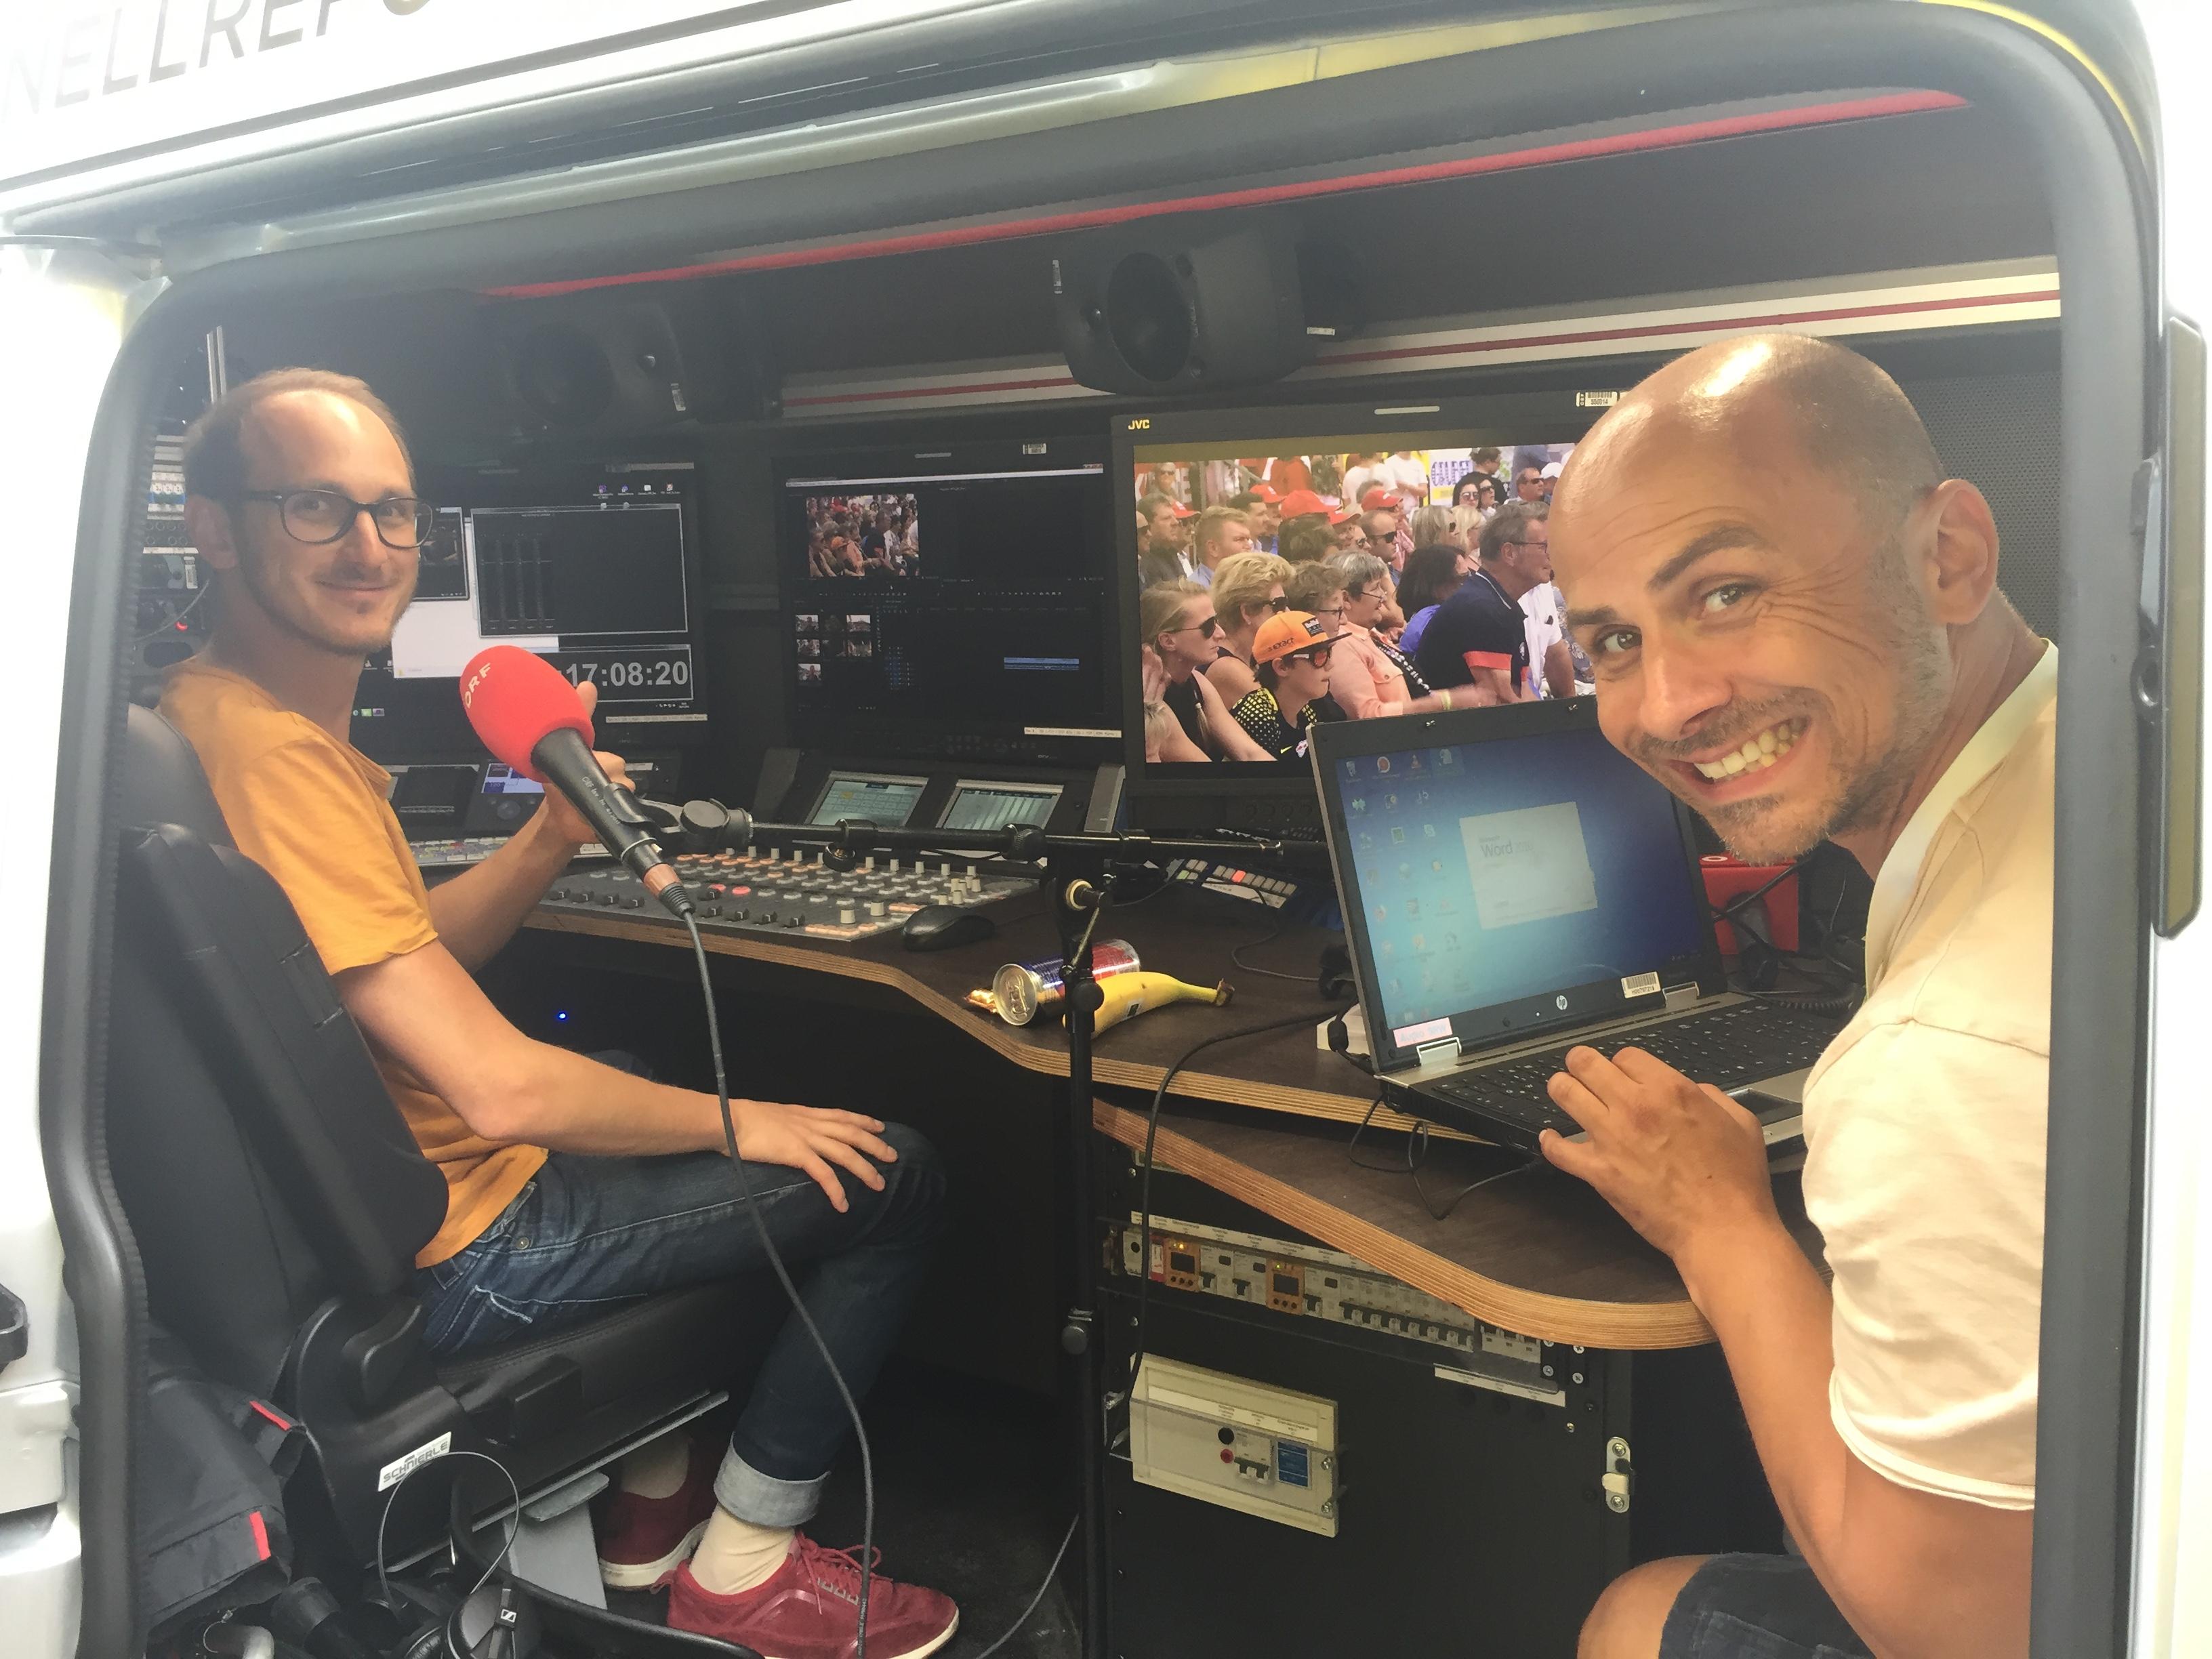 Schnittbus ORF: Thomas und Christian